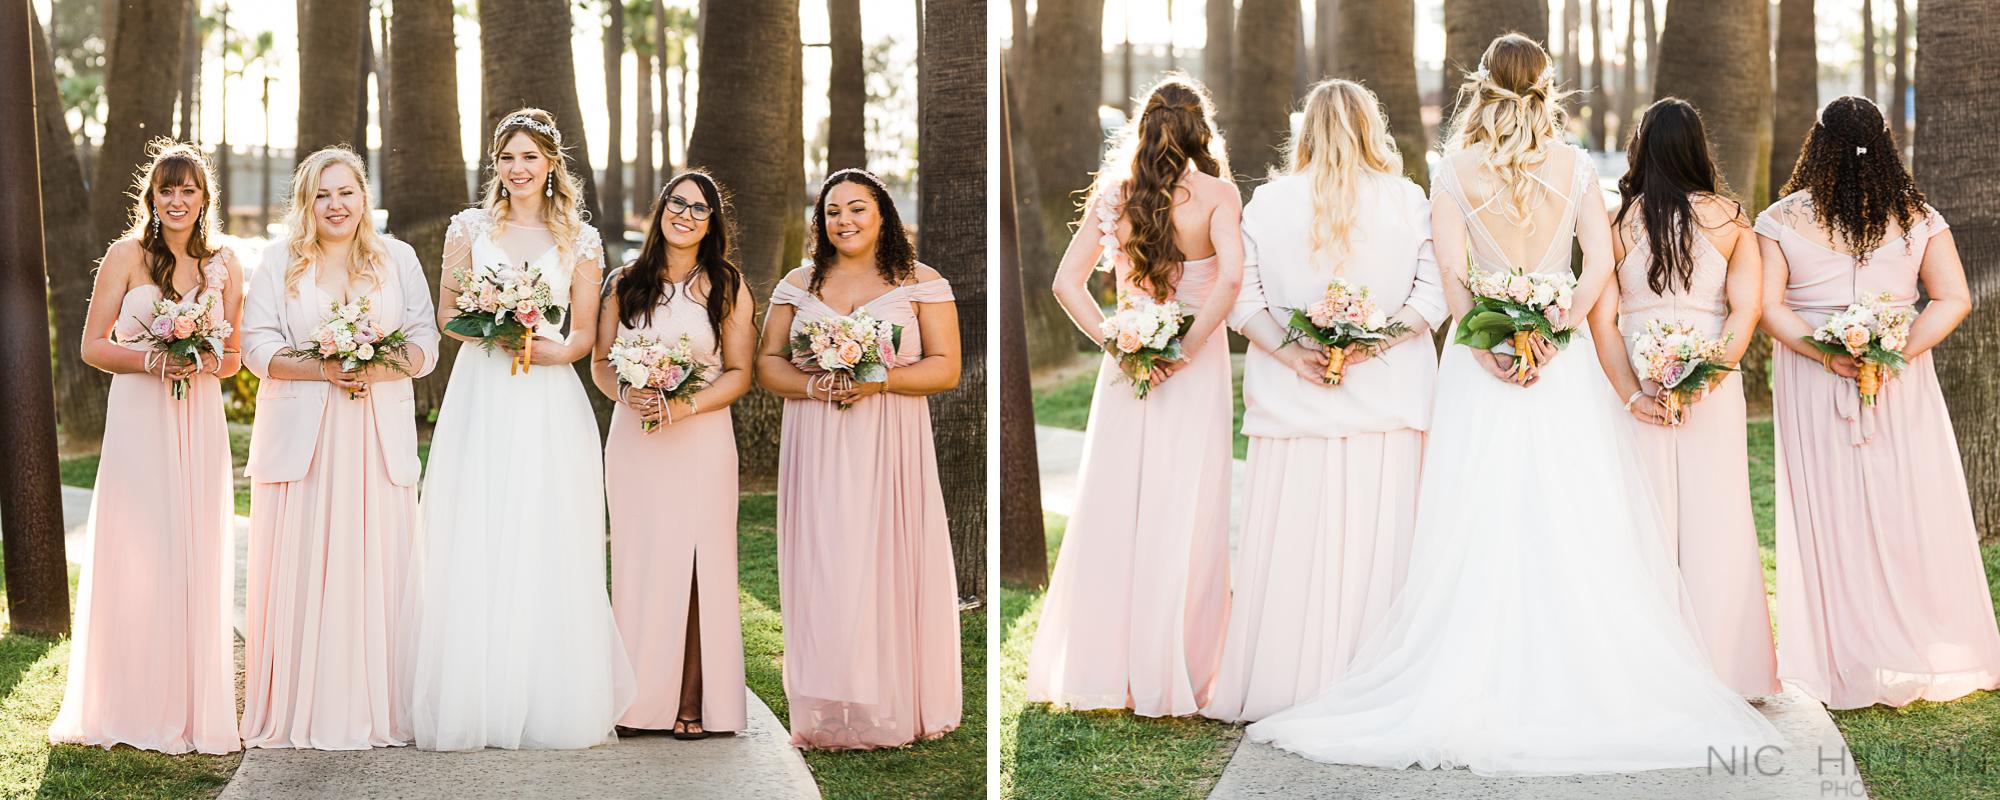 Bridesmaids-Hotel-Maya-Long-Beach-Wedding.jpg